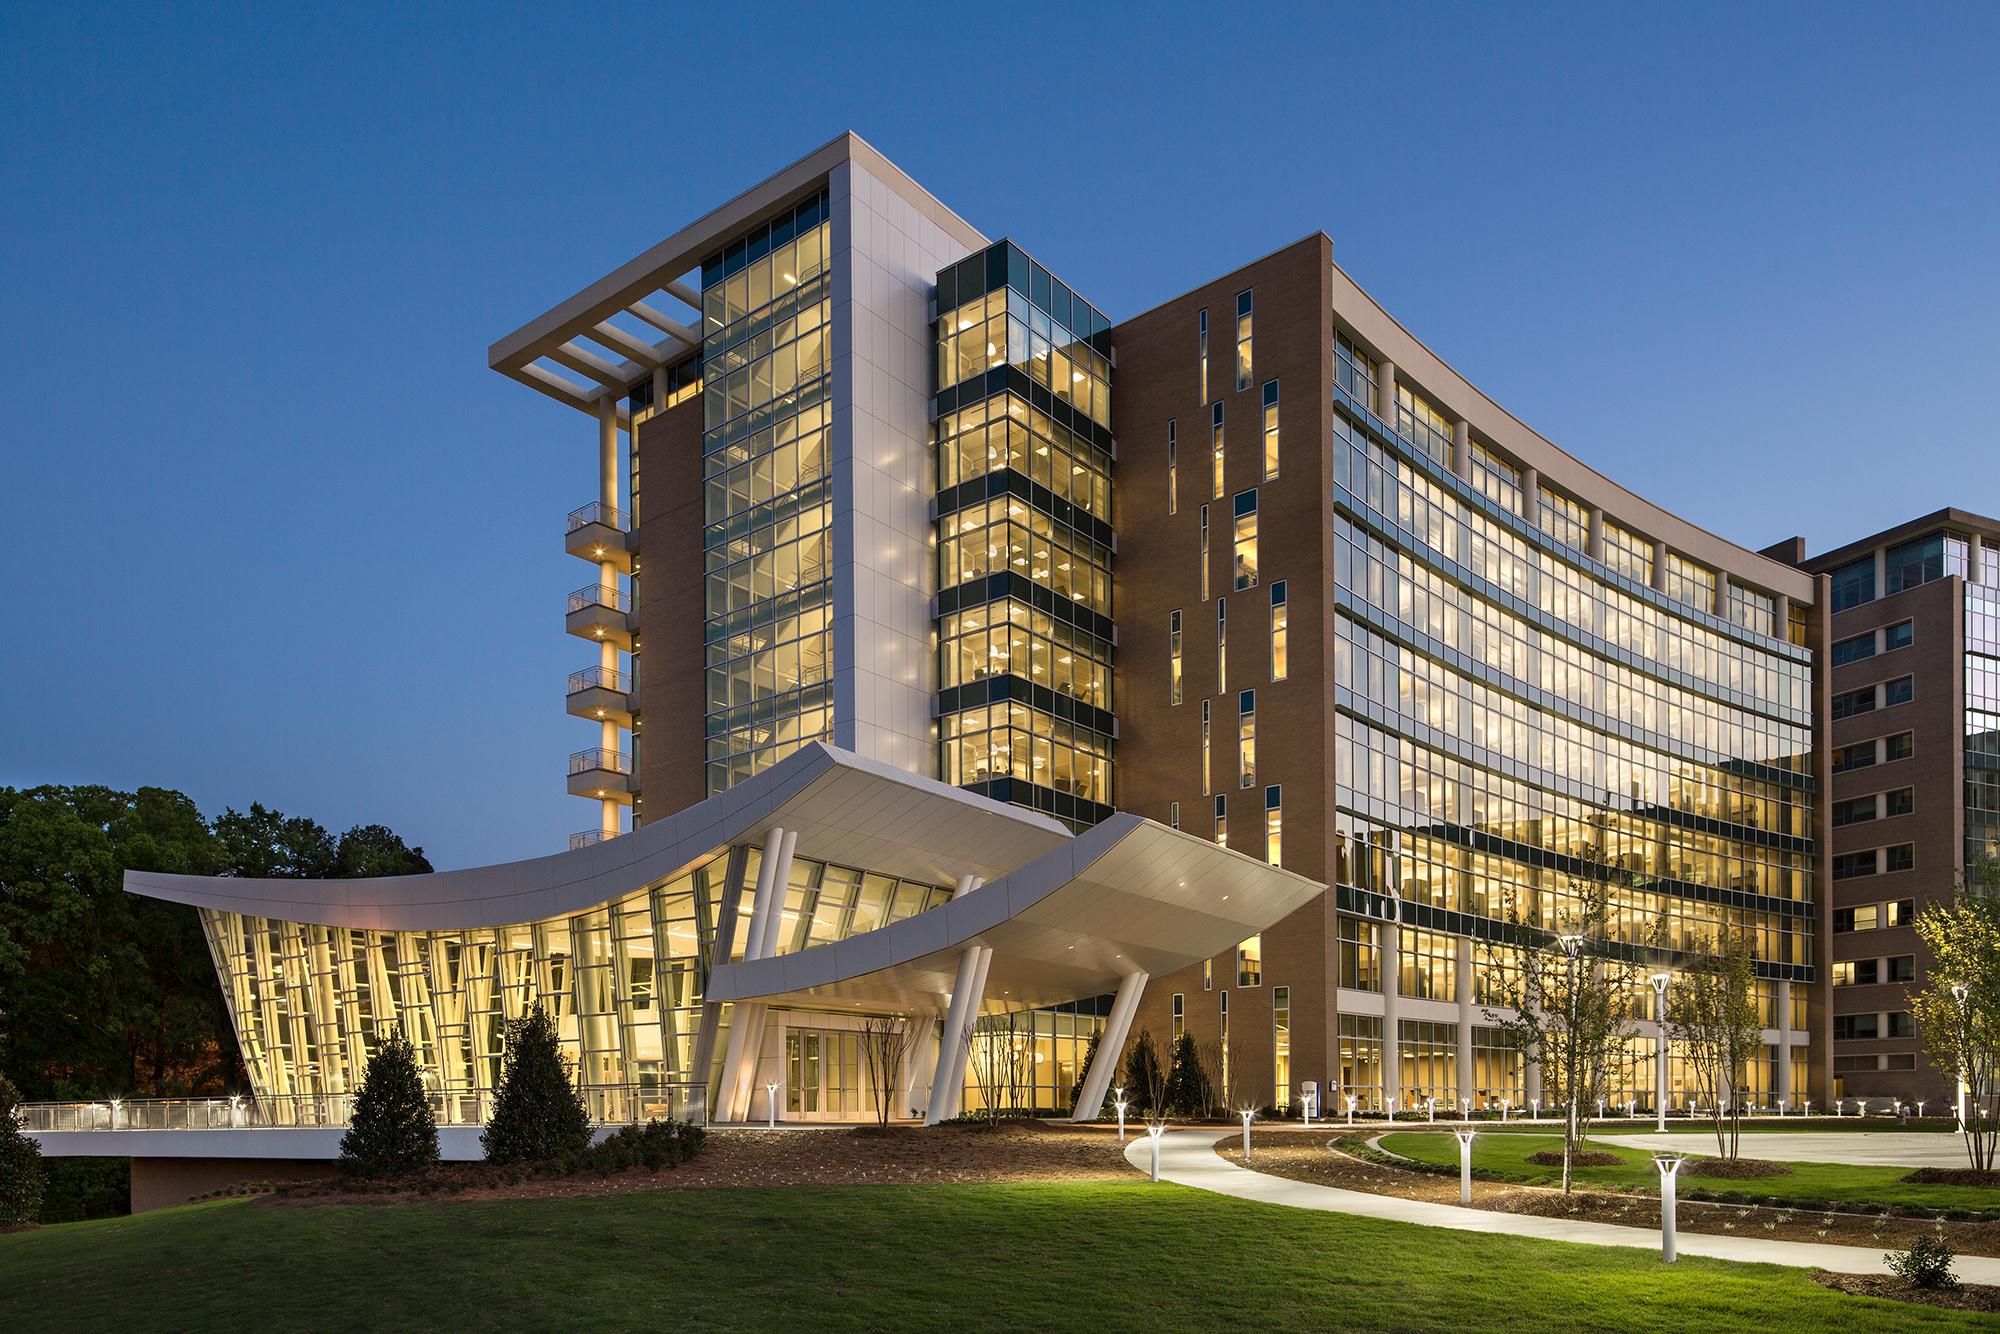 2 Story Commercial Office Building Design Joy Studio